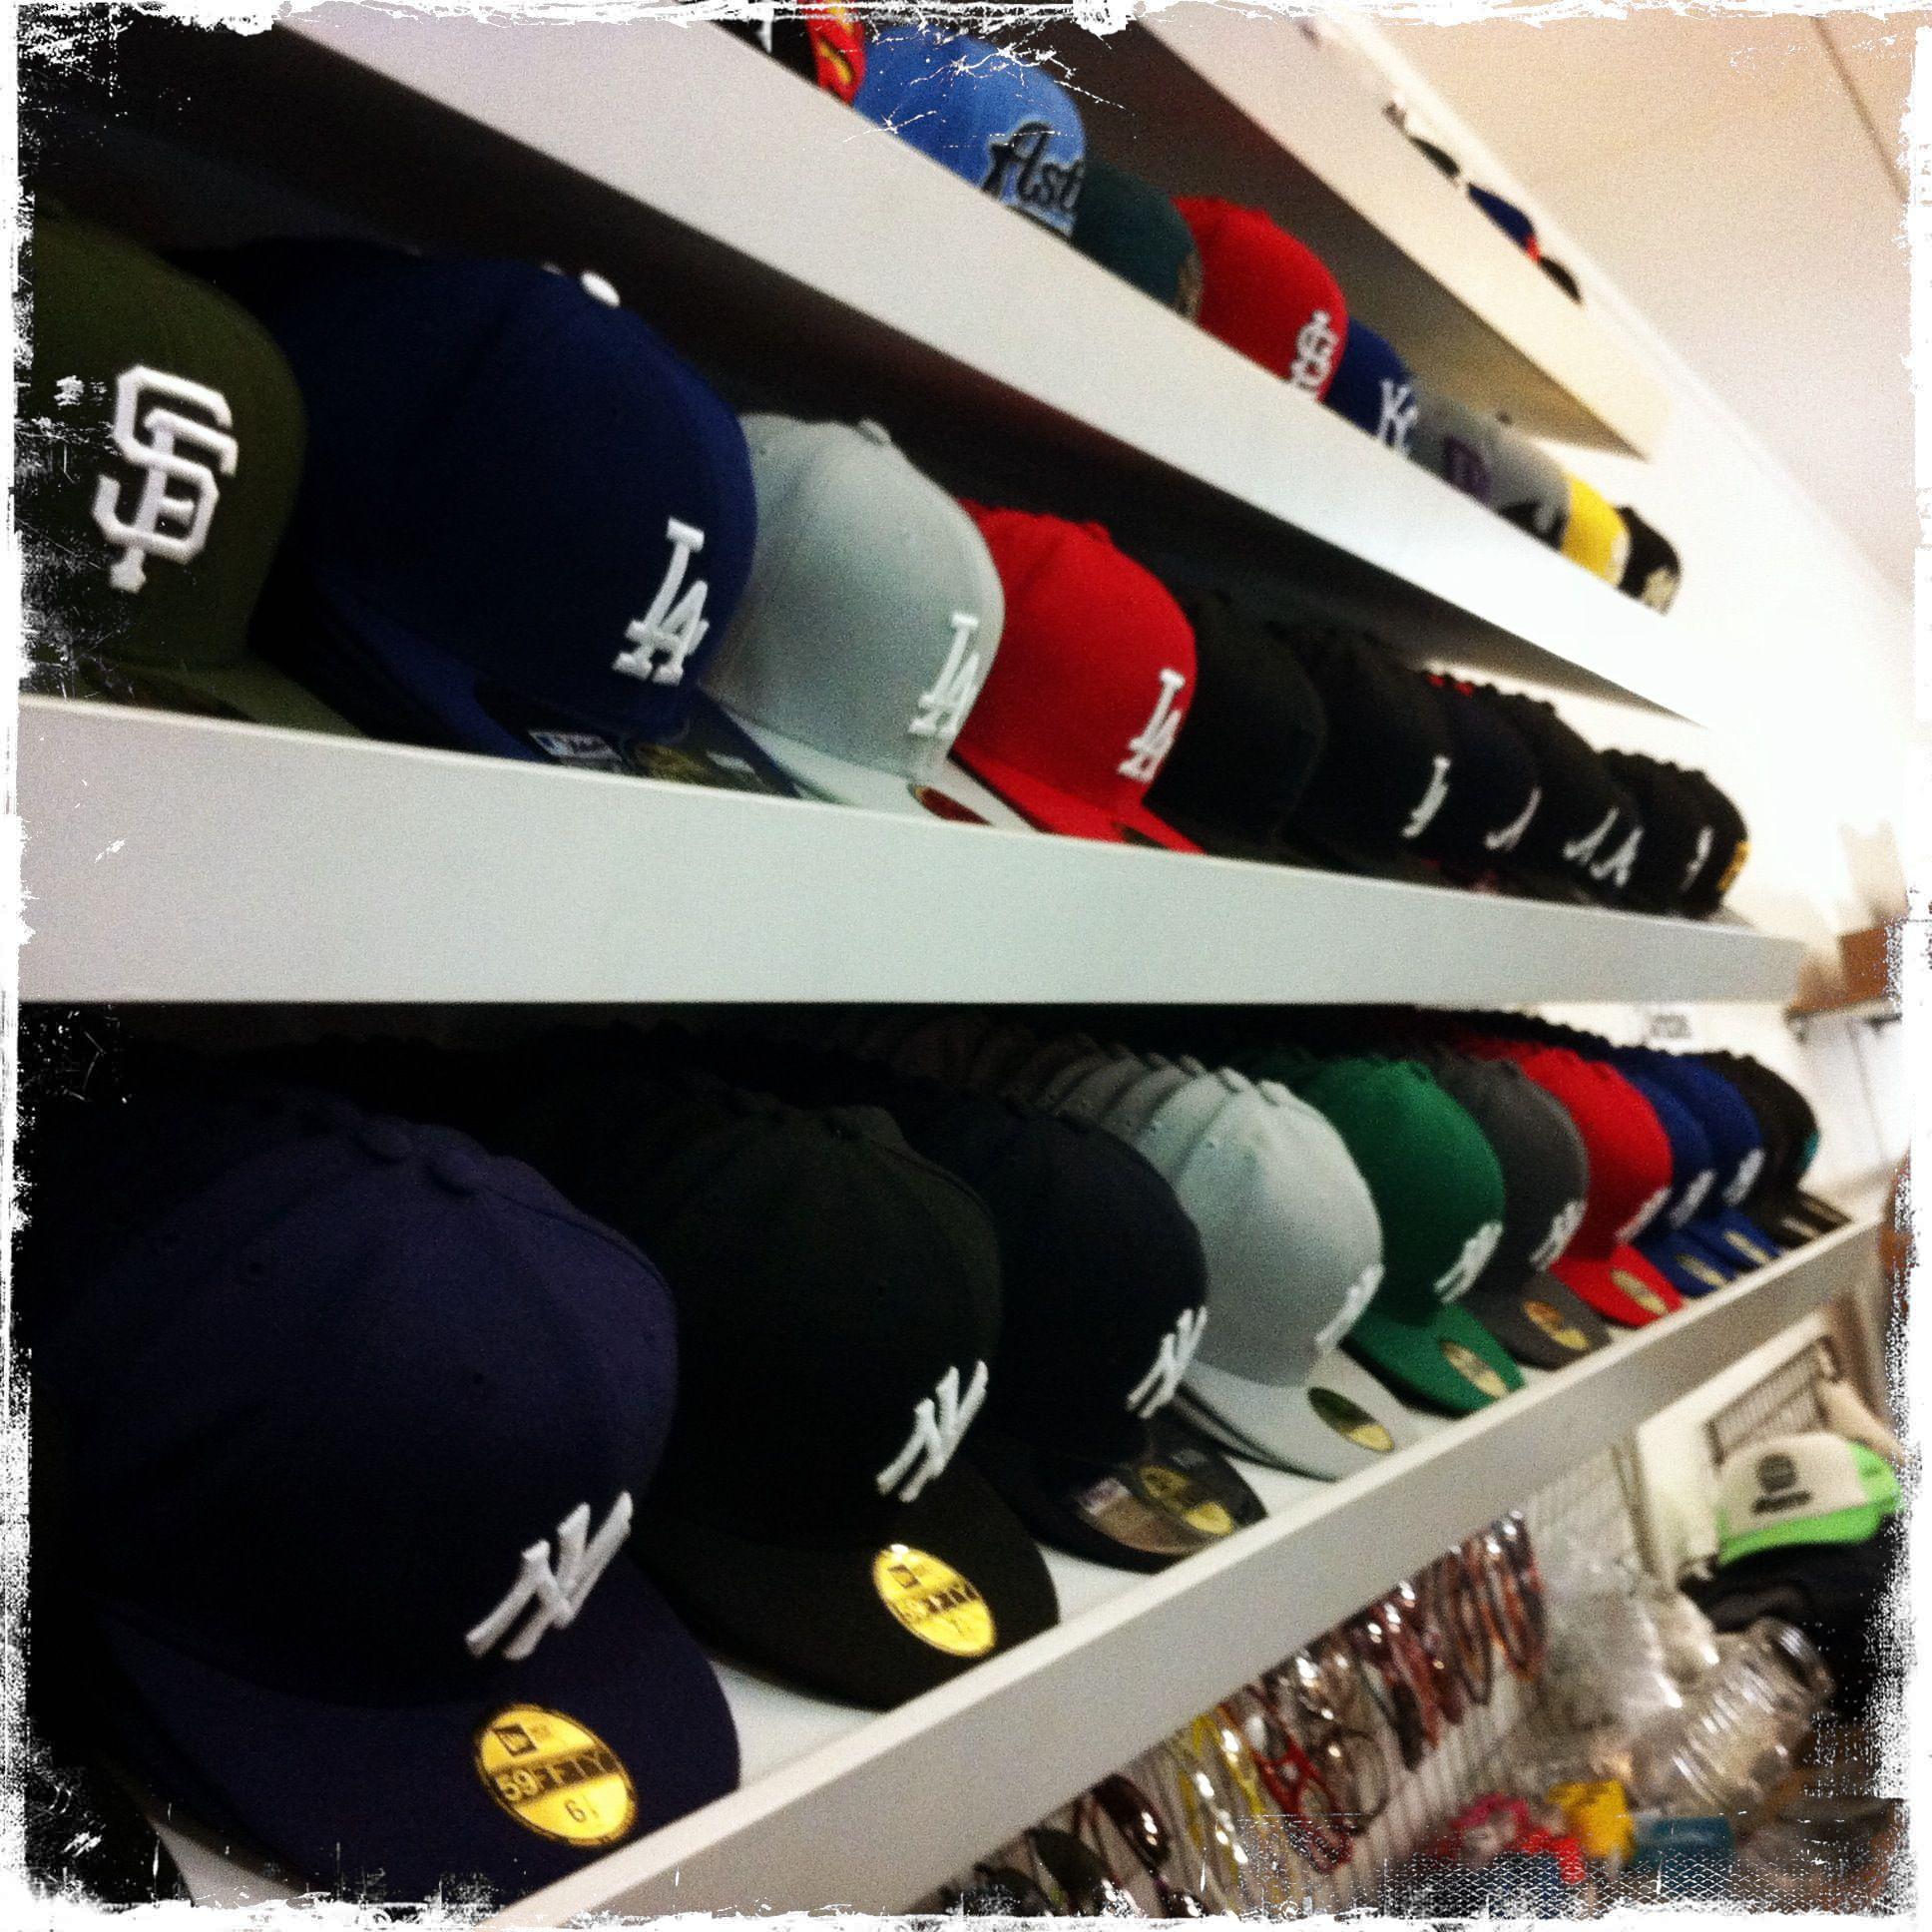 Beautiful Hat Hanger Ideas Hat Shelves Ideas Baseball Hat Rack Ideas Homemade Hat Rack  Ideas Cowboy Hat Rack Ideas Cool Hat Rack Ideas Hat Display Rack Ideas Diy  Hat ...